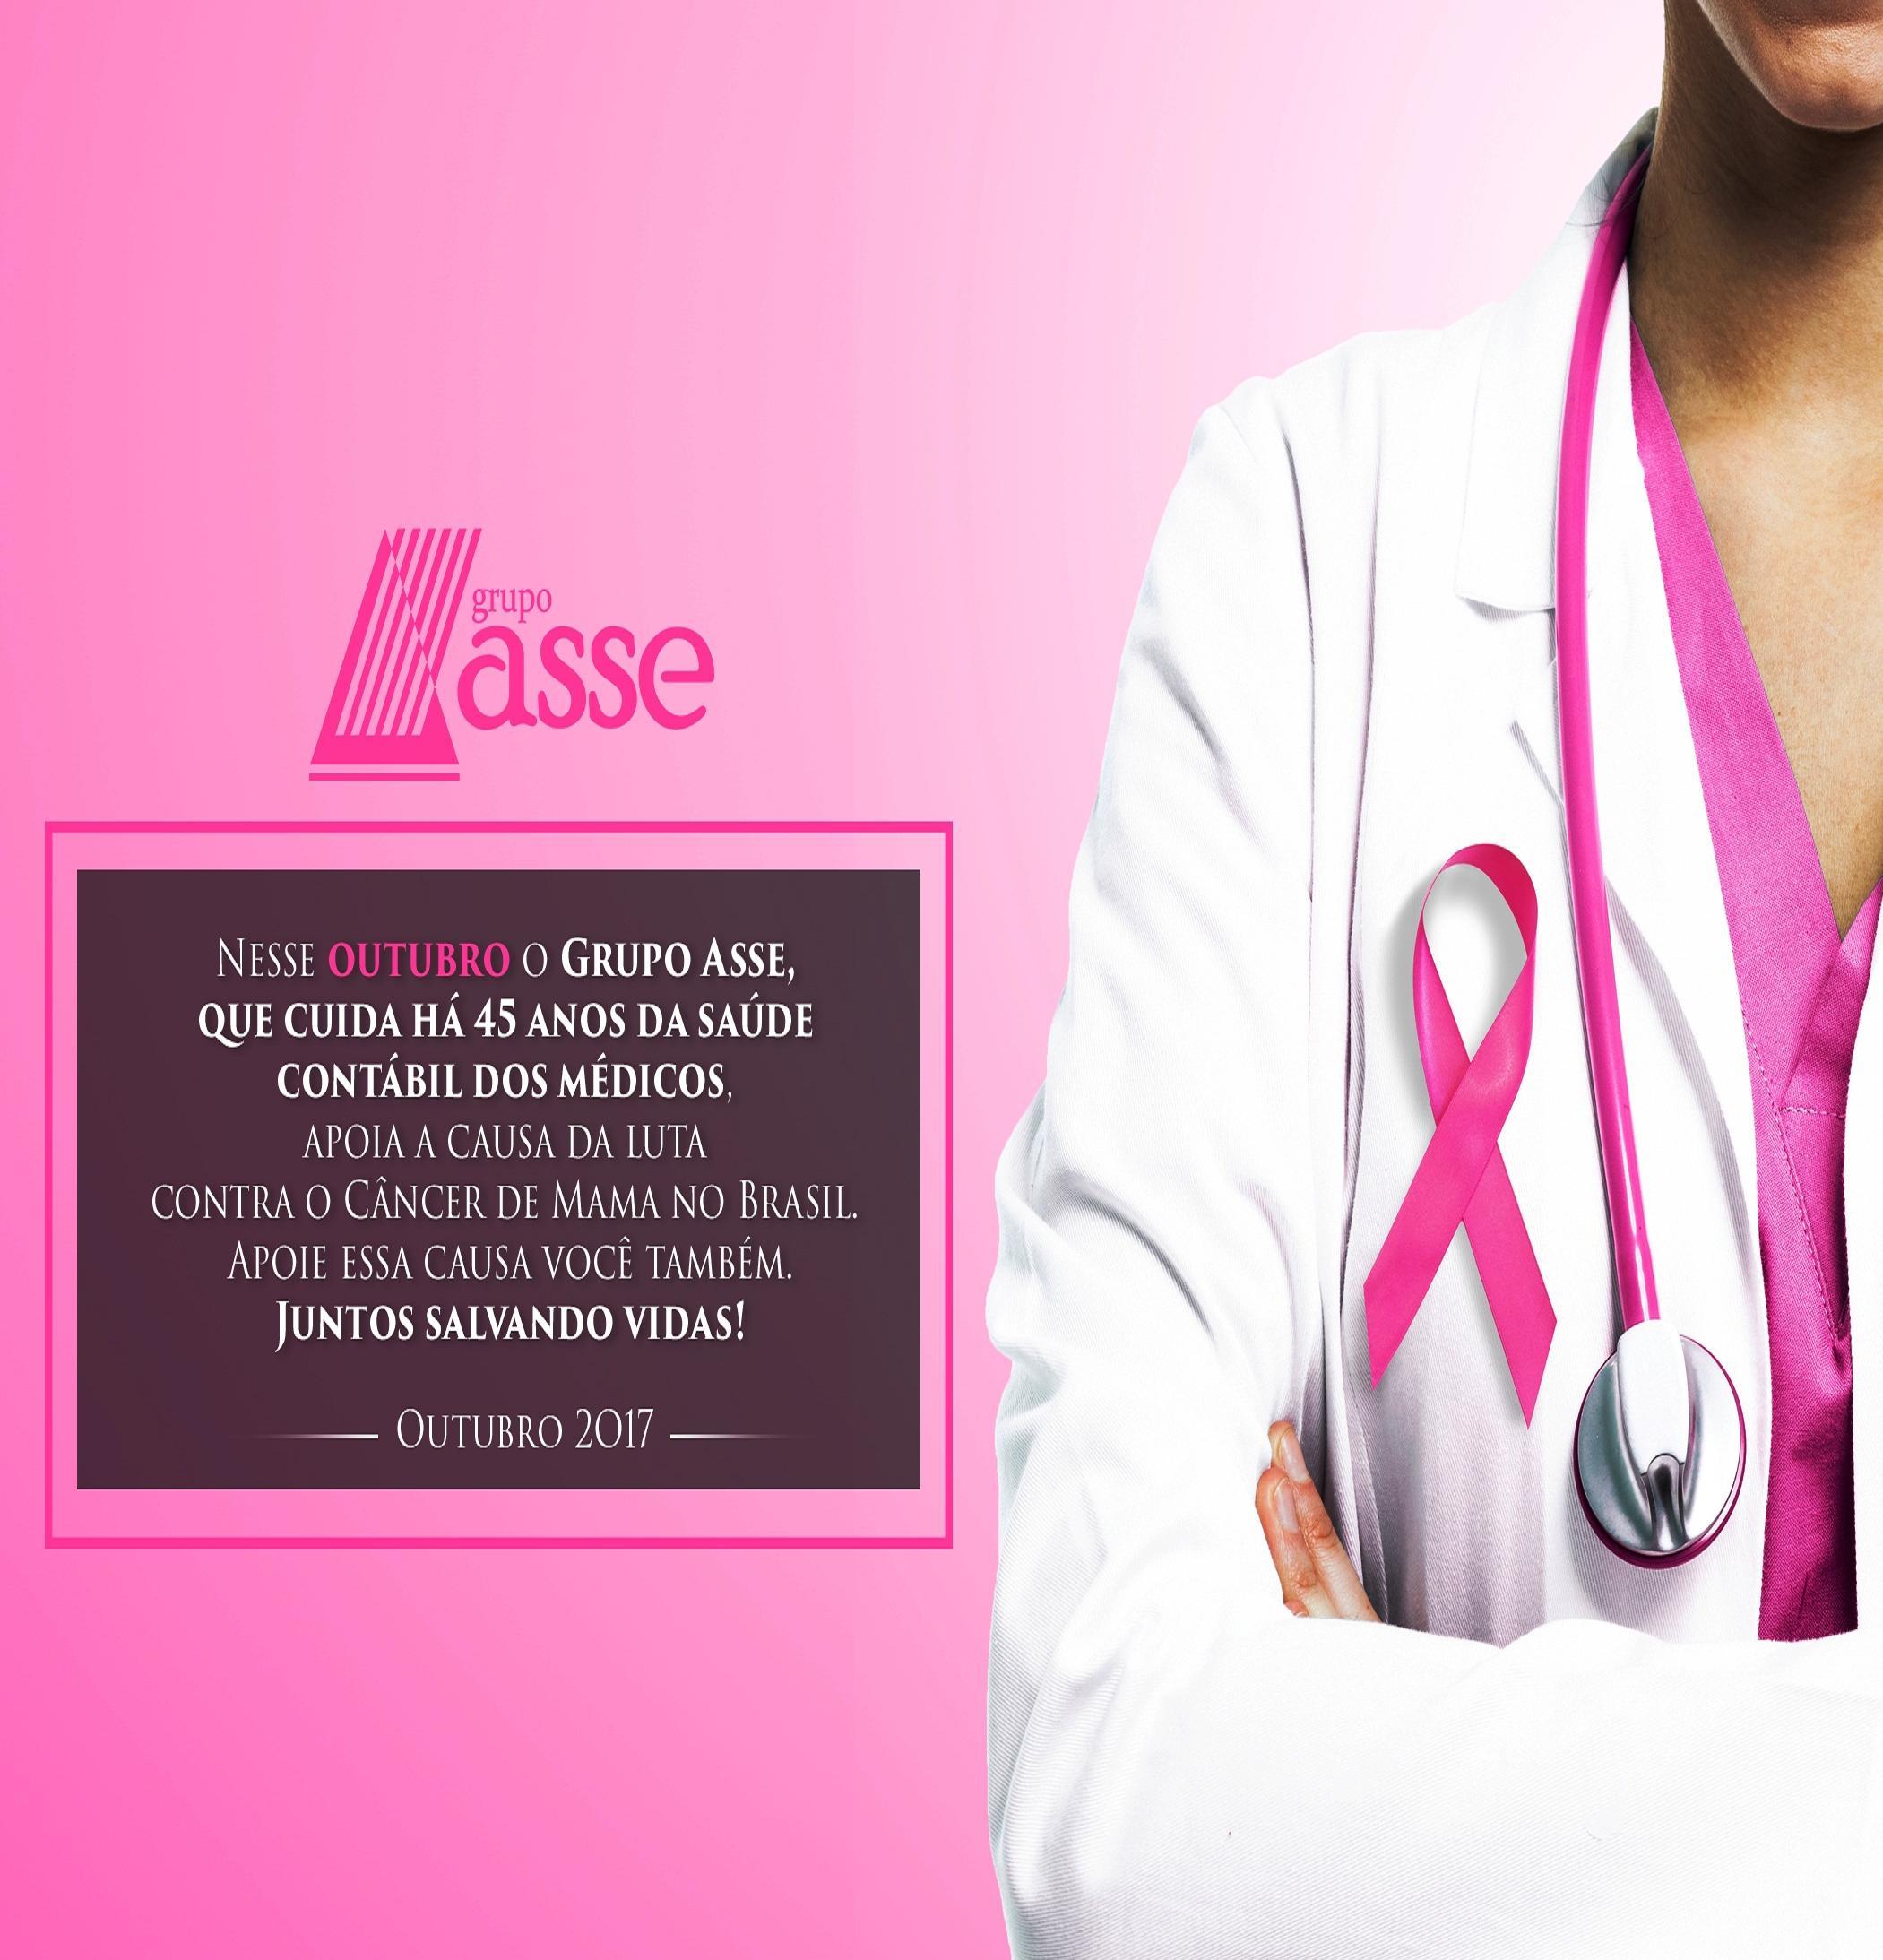 Healthcare, medicine and breast cancer concept